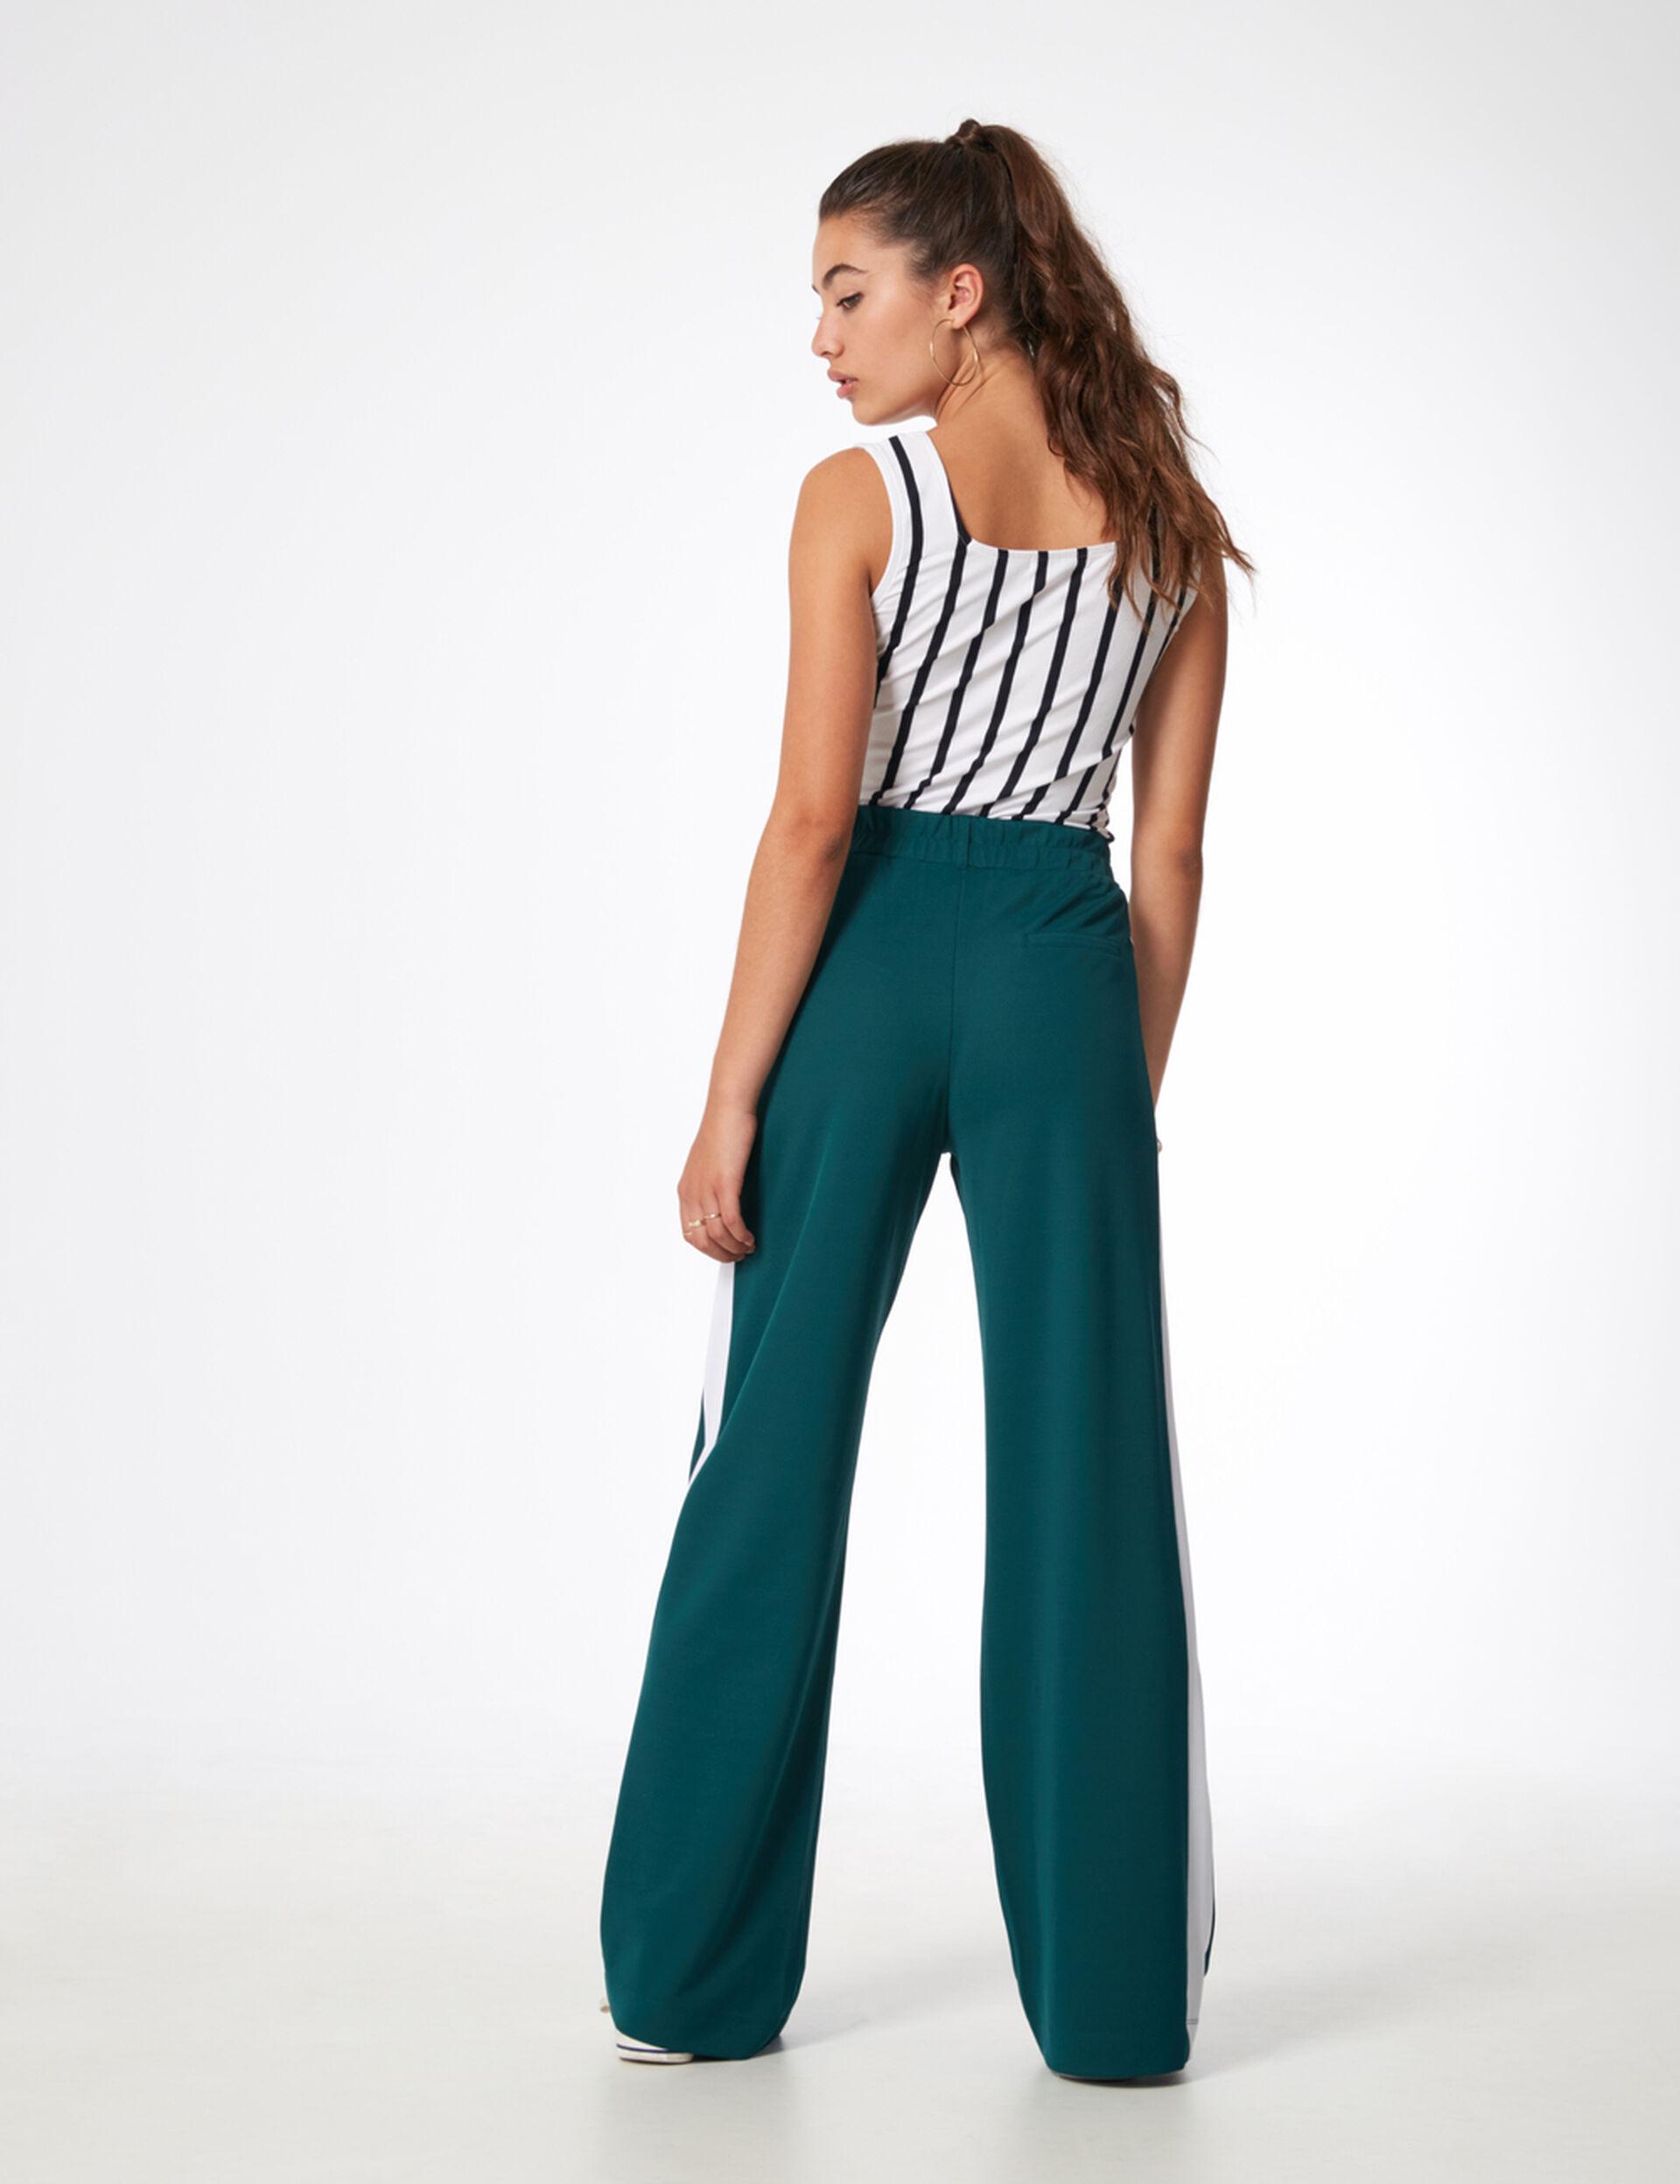 pantalon large avec bandes vert